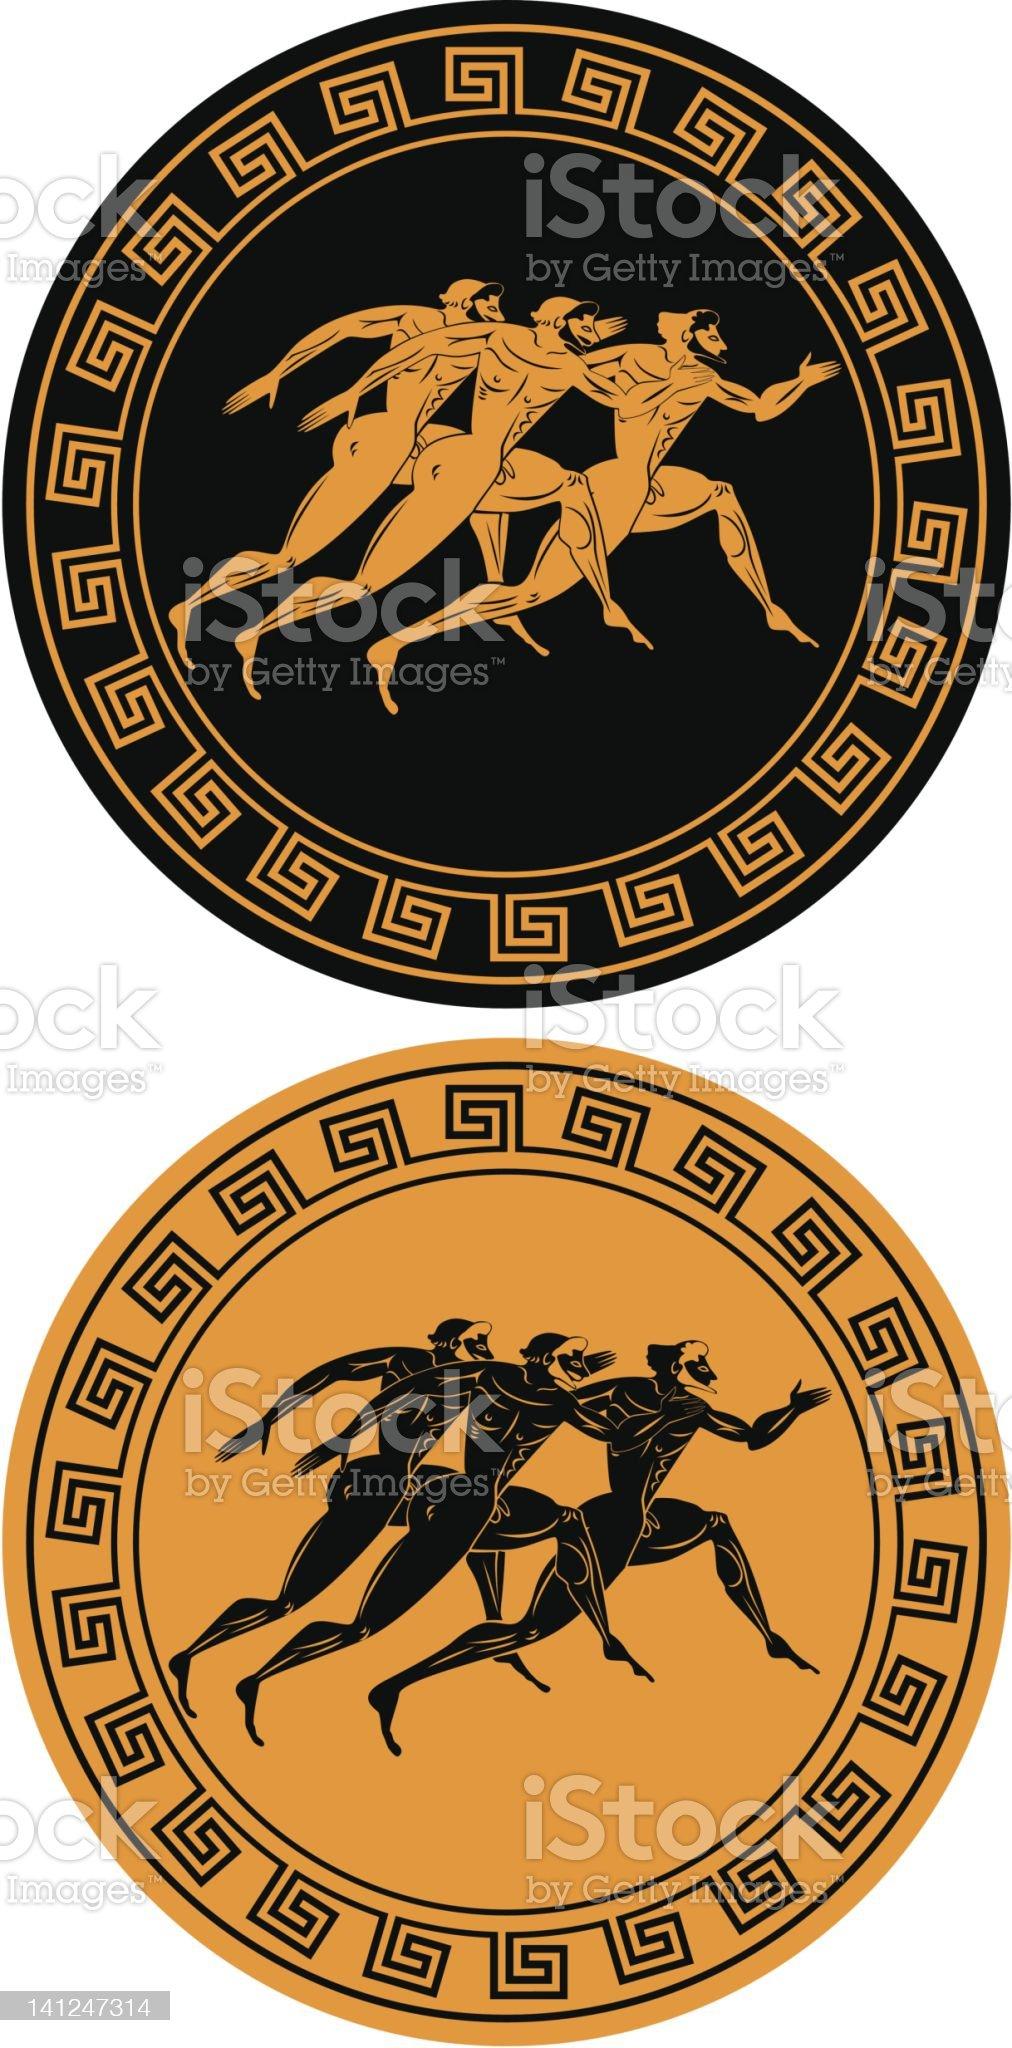 ancient athletes royalty-free stock vector art